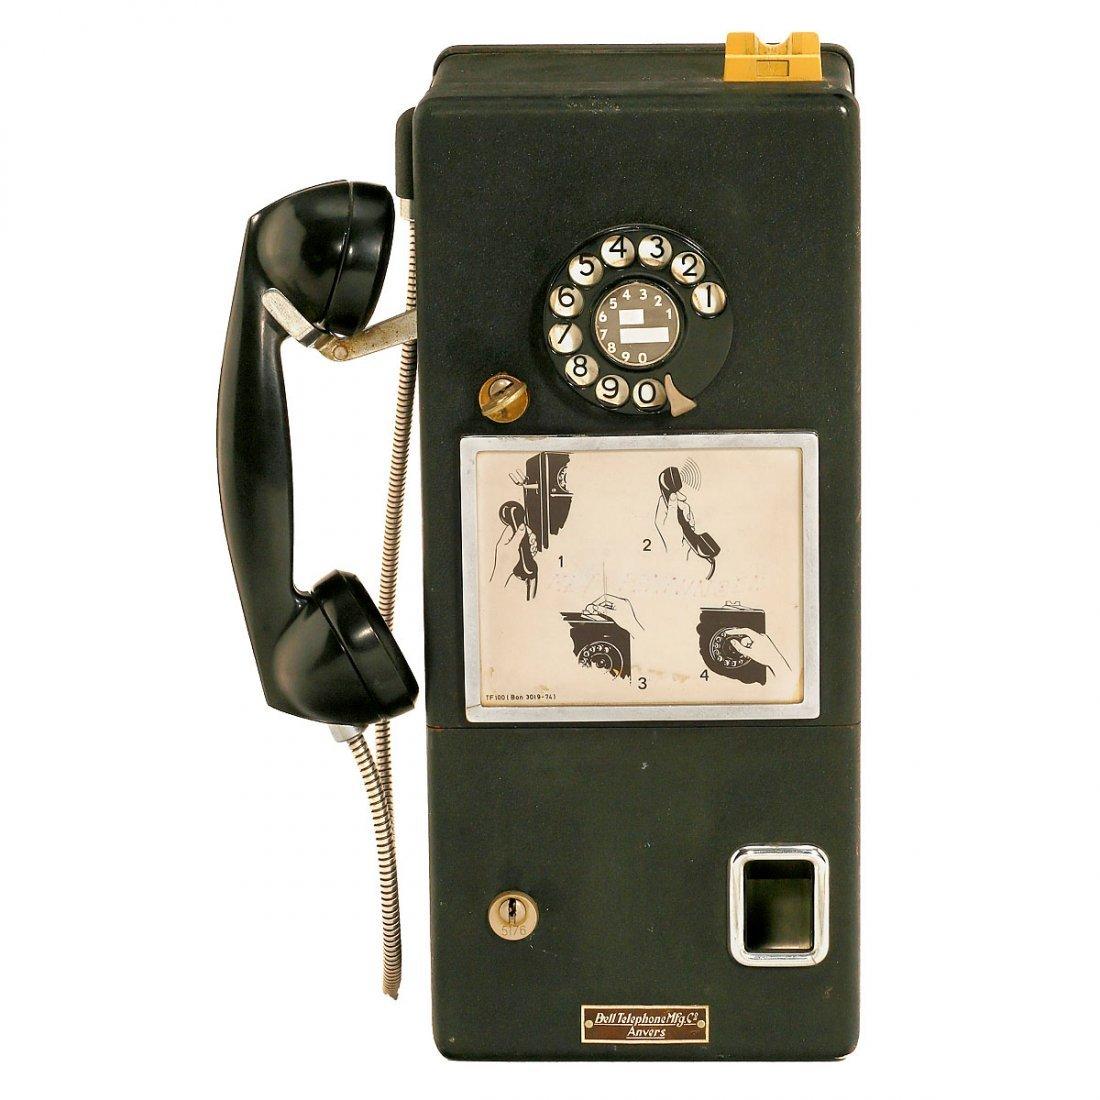 Bell Telephone Payphone, 1966